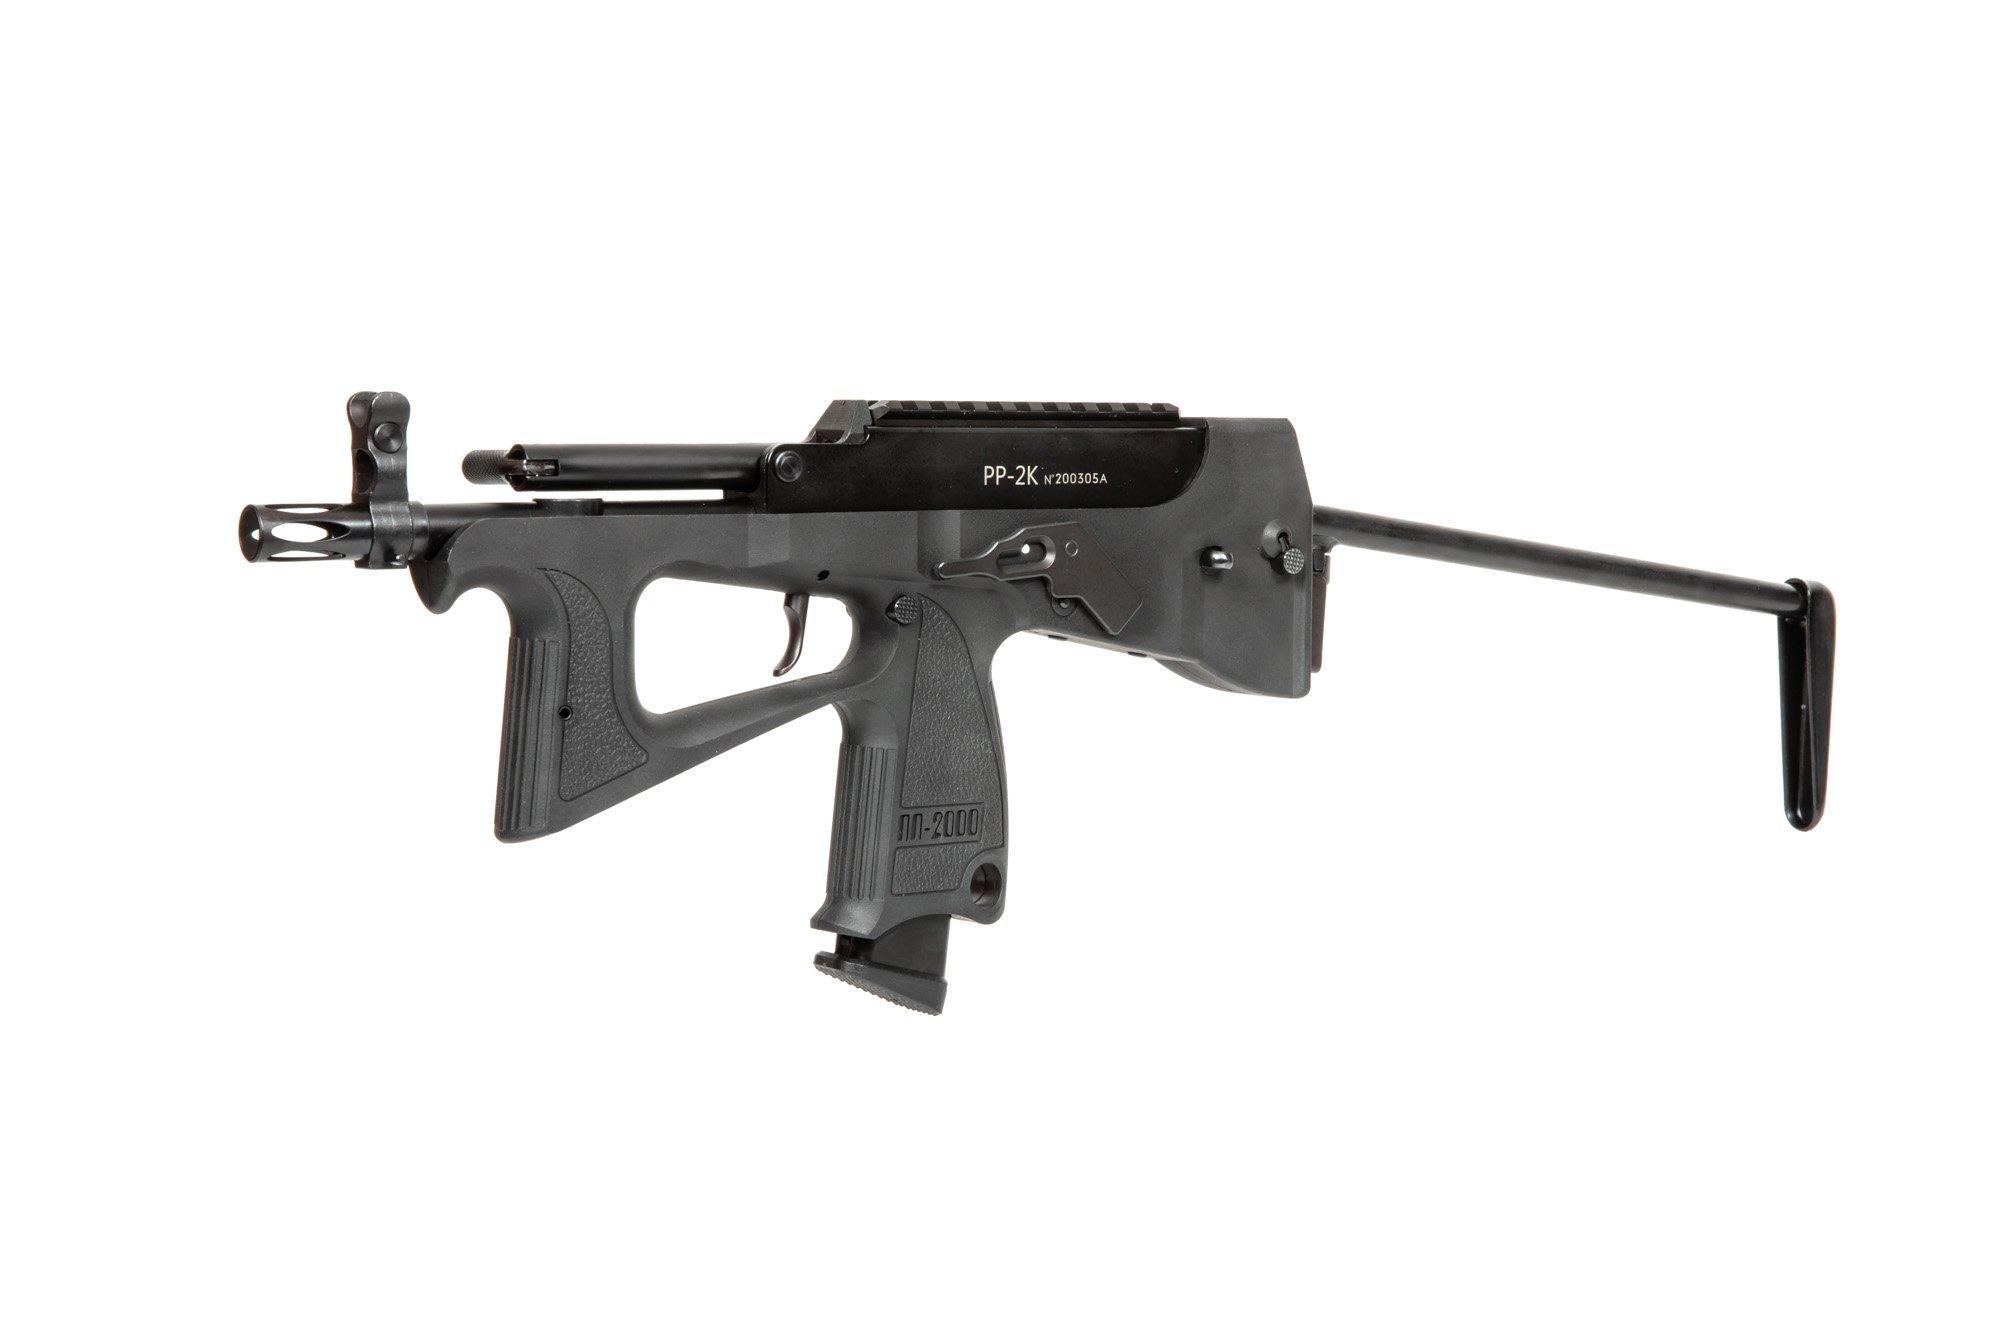 Modify Russian PP-2K SMG GBB 1.20 joules - BK